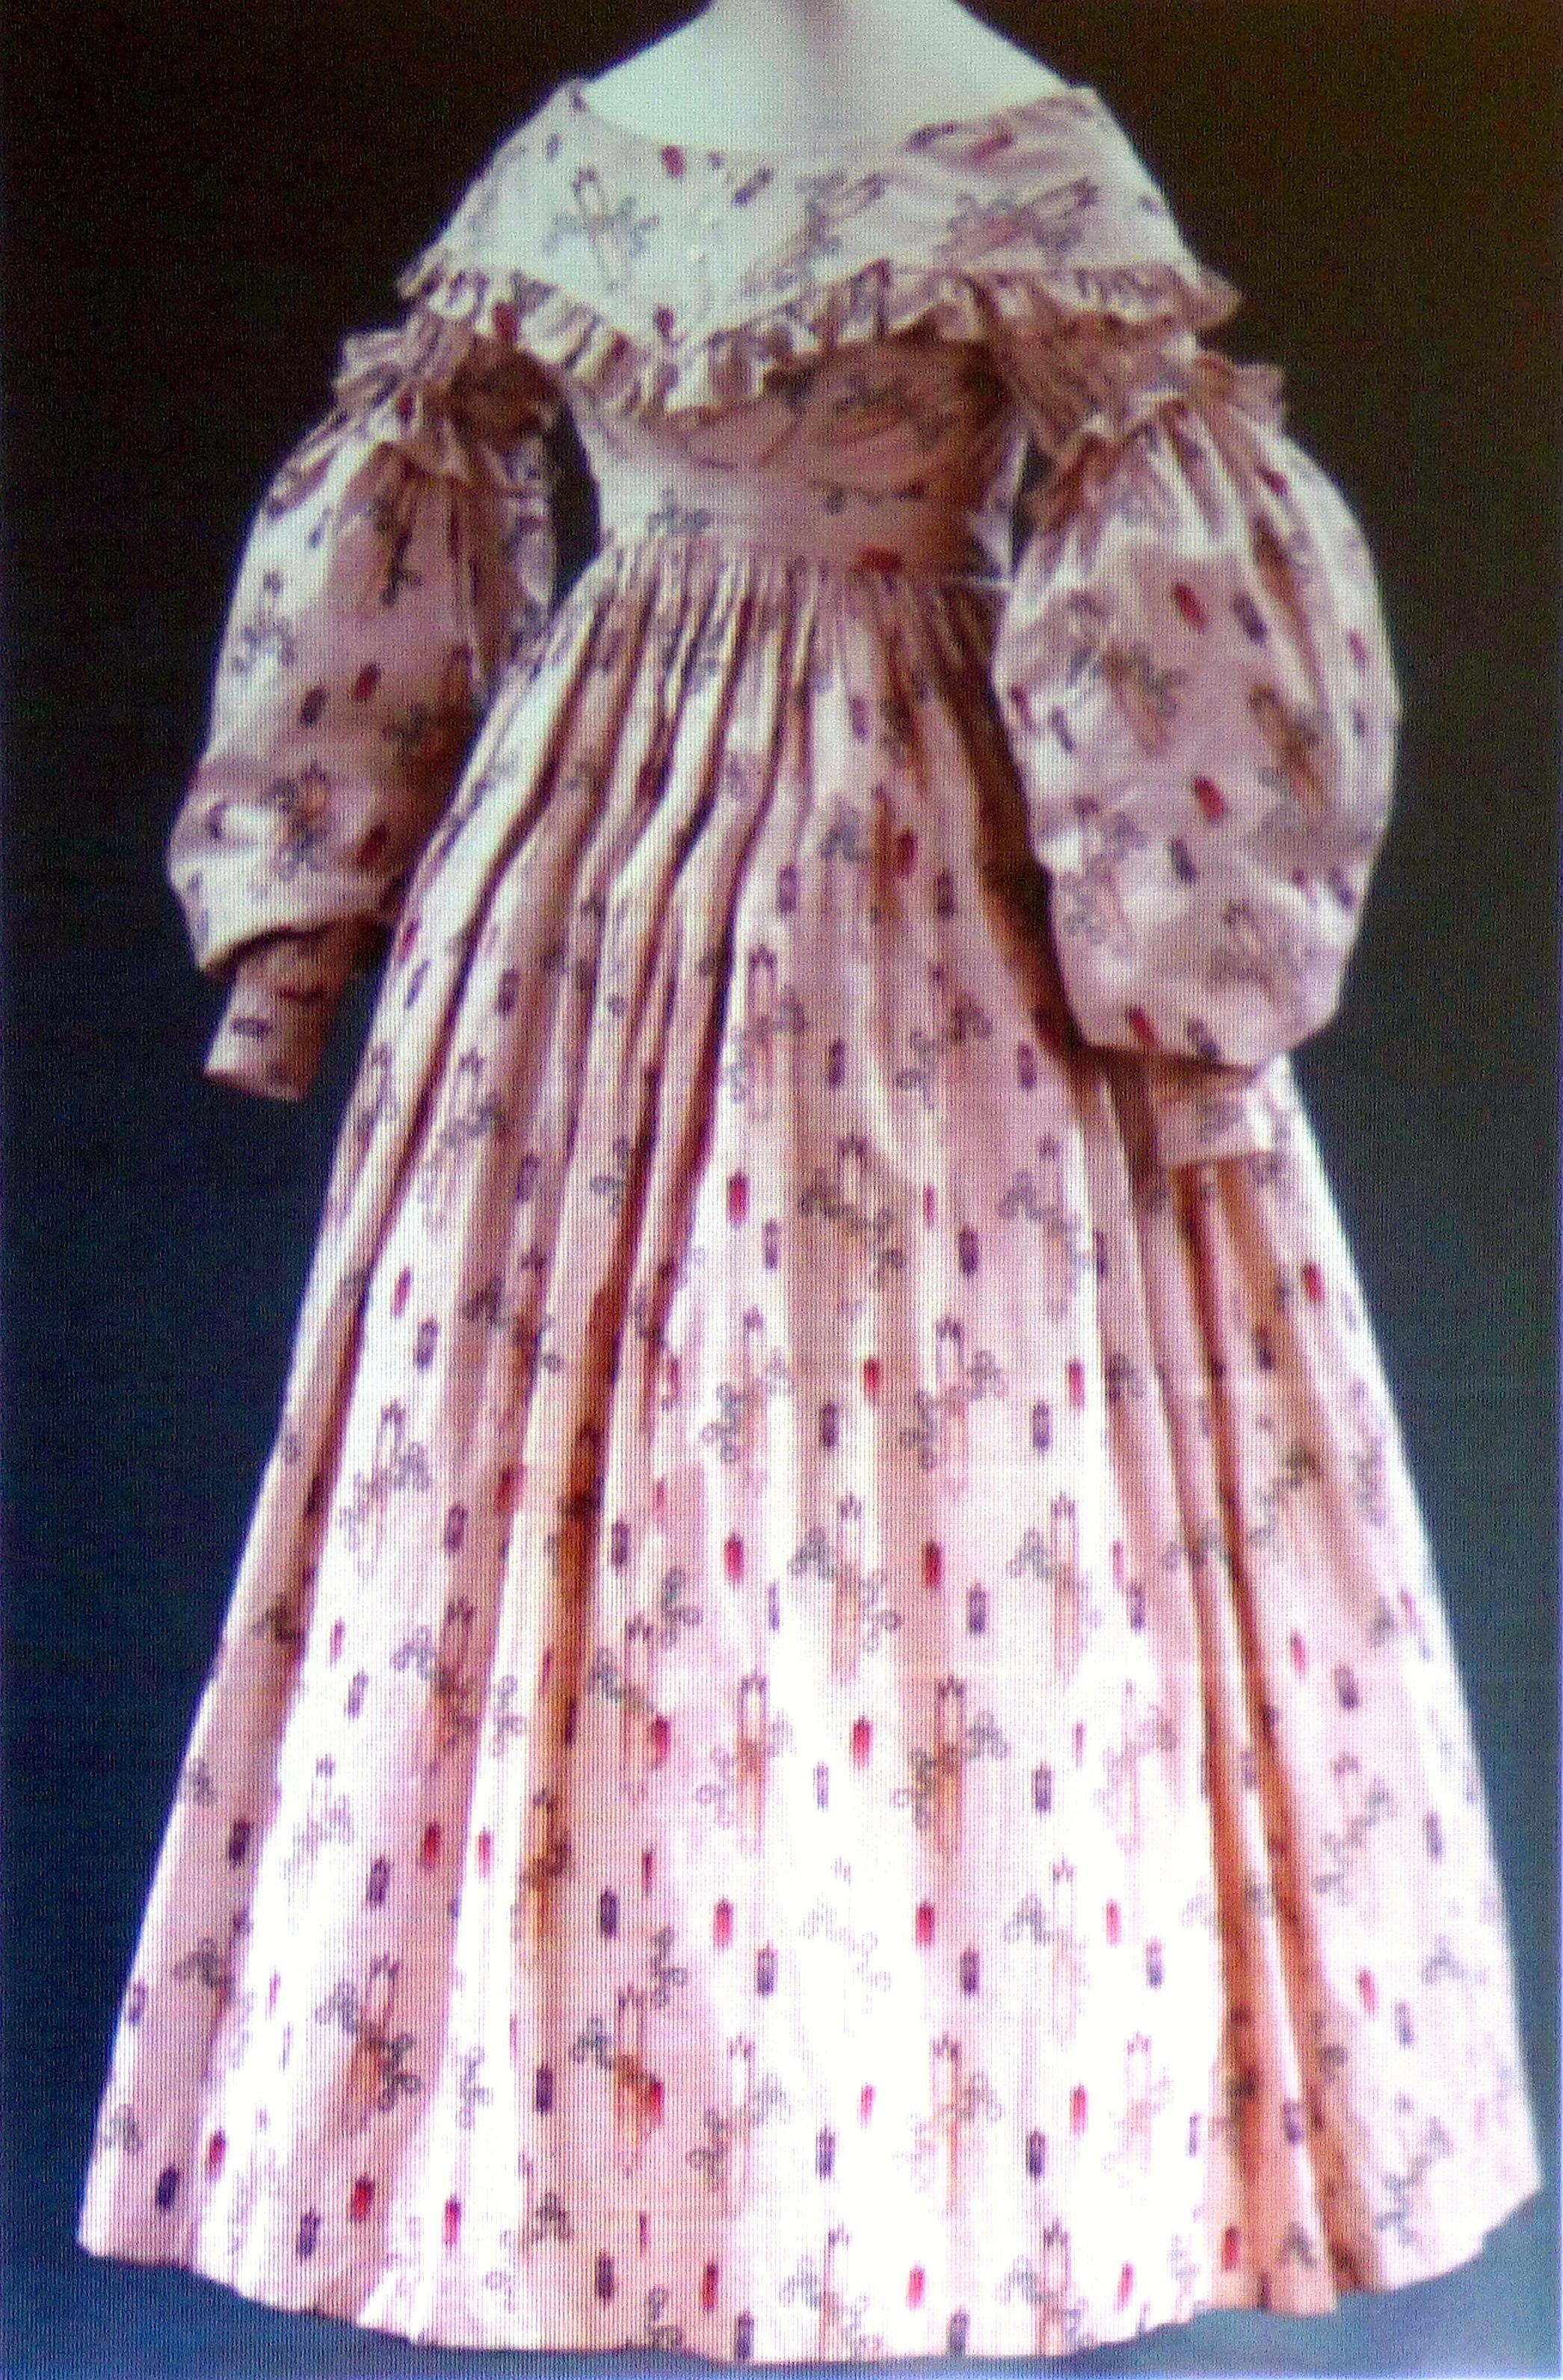 slide showing cotton wedding dress 1841, History of the Wedding Dress talk by Gill Roberts, MEG 2018